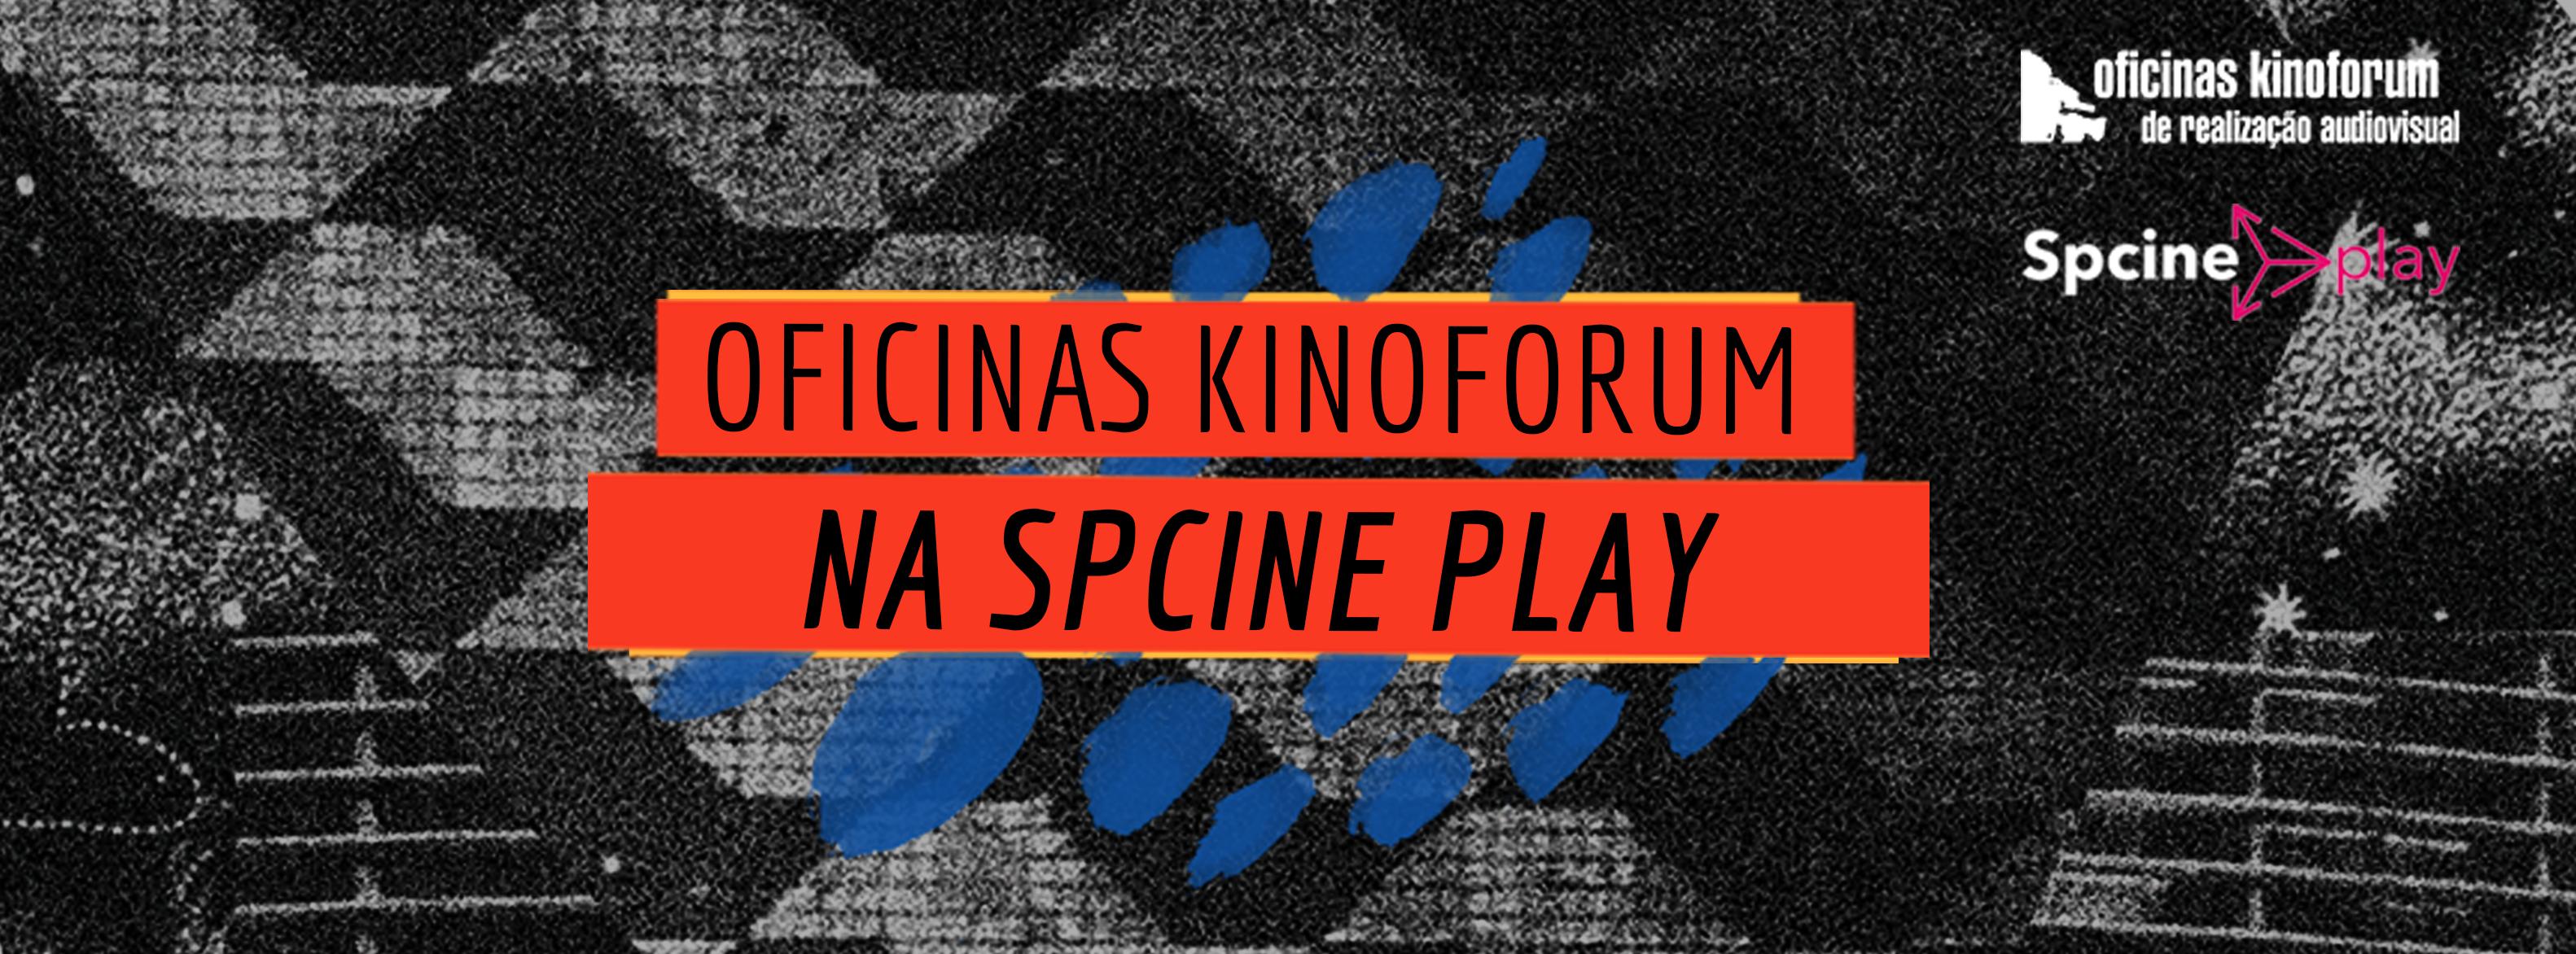 Oficinas Kinoforum na Spcine Play!